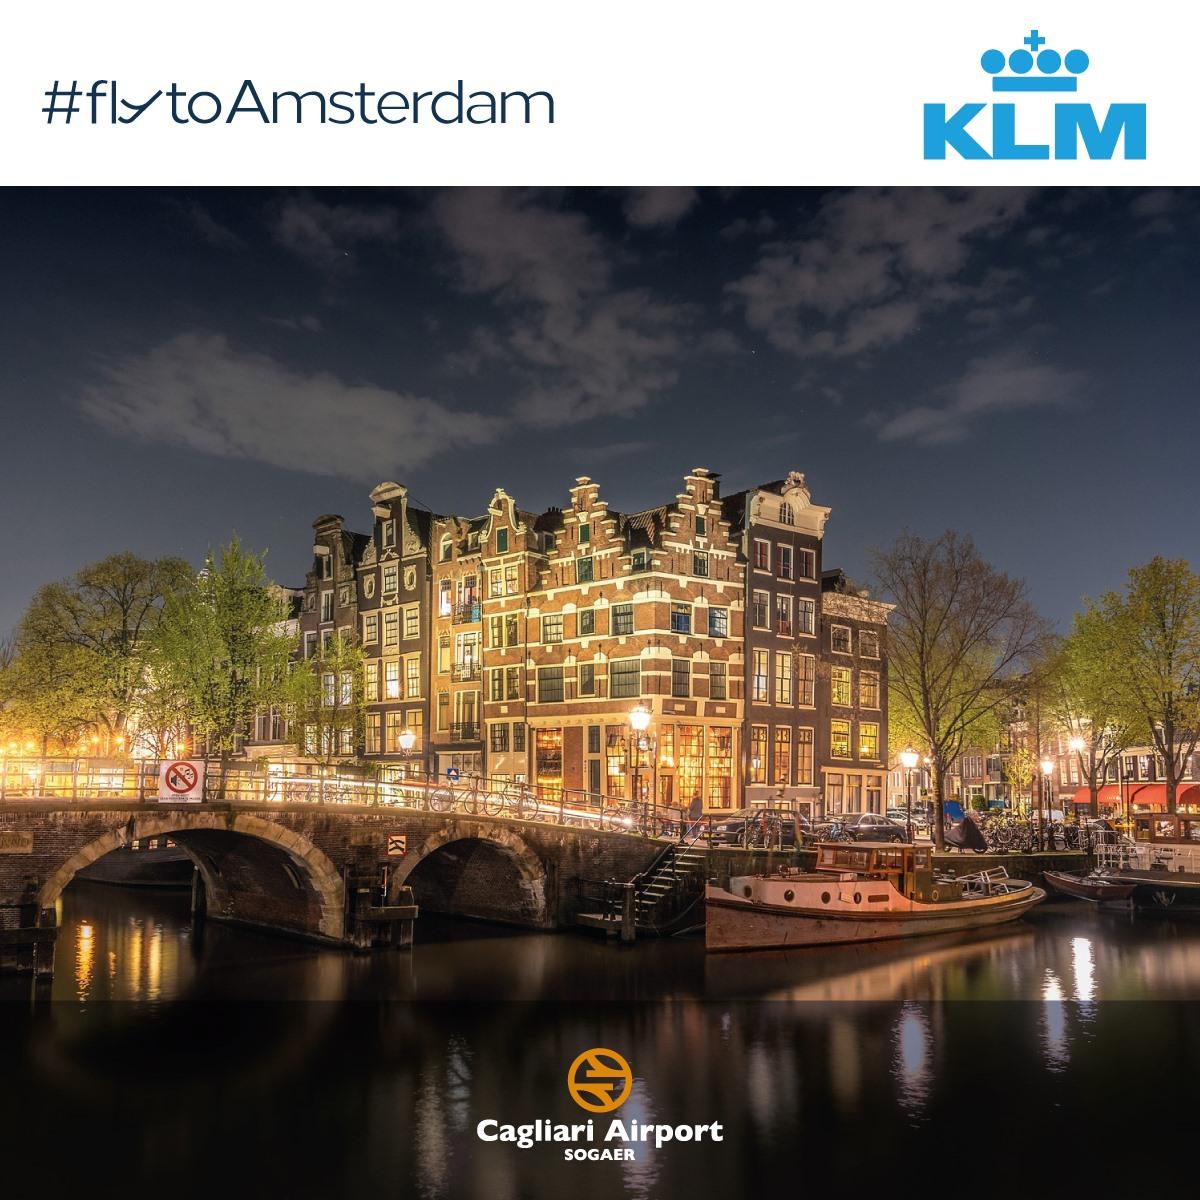 KLM AMSTERDAM